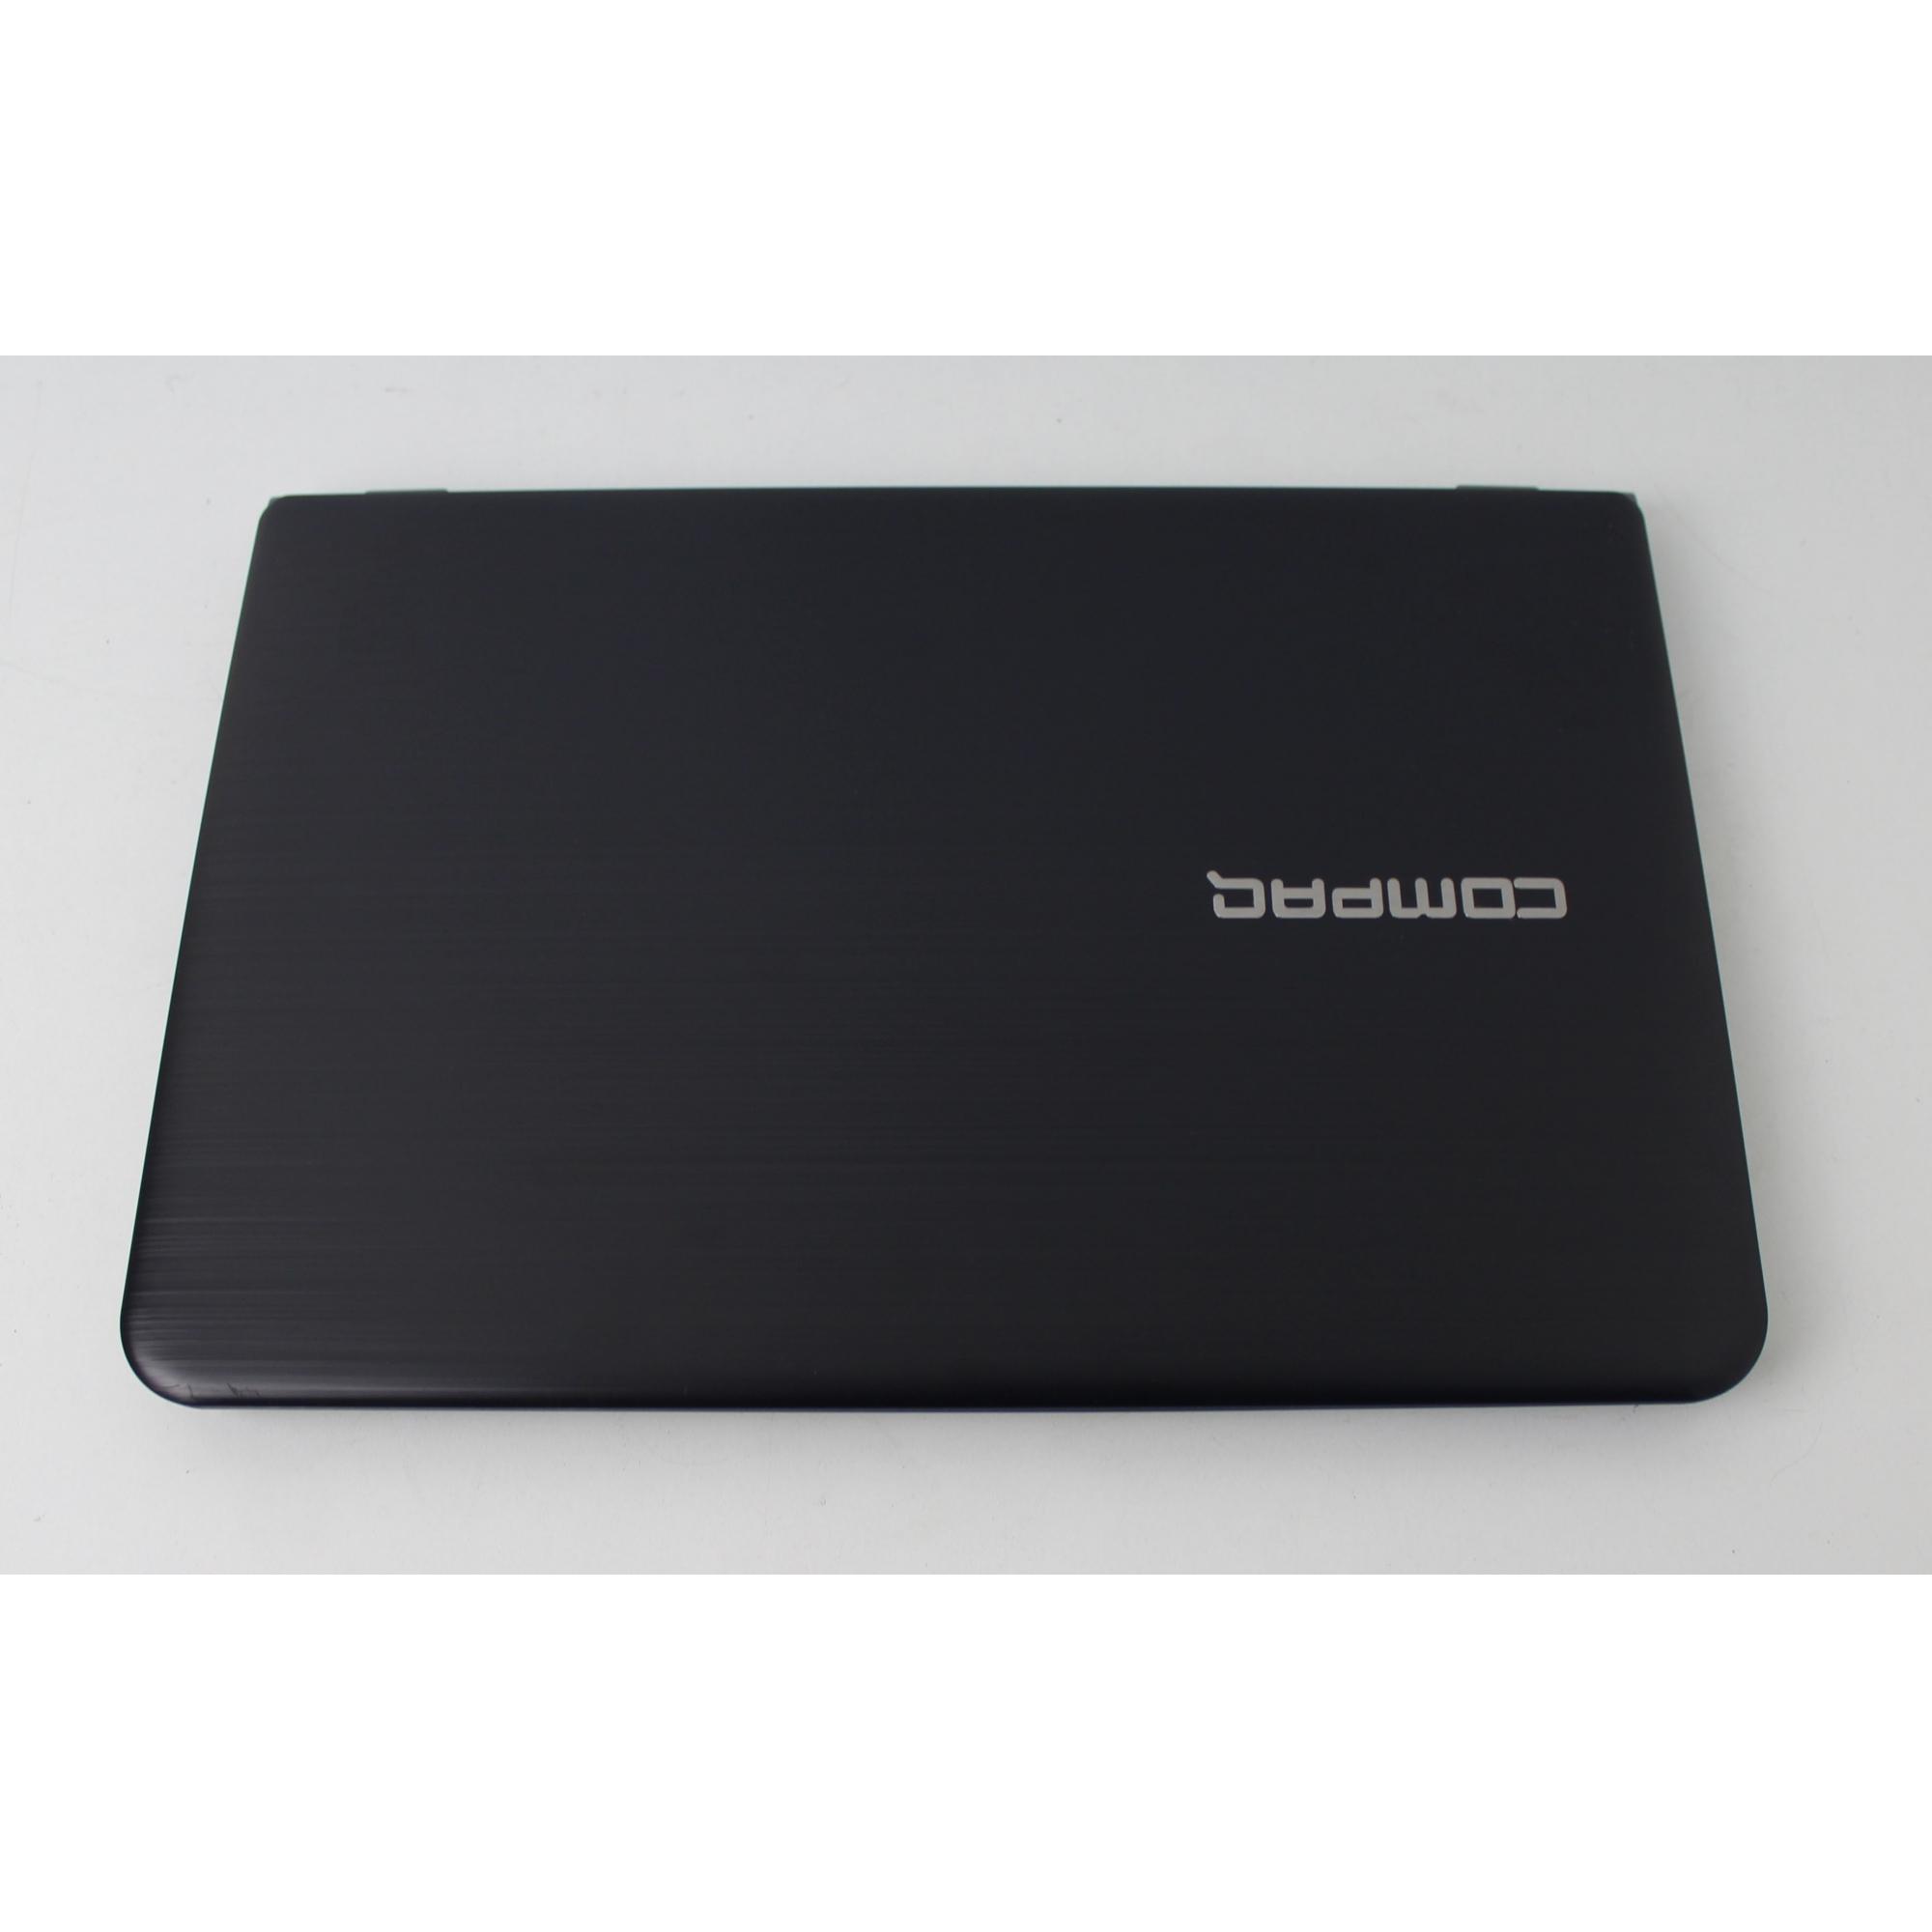 "NOTEBOOK COMPAQ PRESARIO CQ-17 14"" DUAL CORE 4GB HD-500GB"